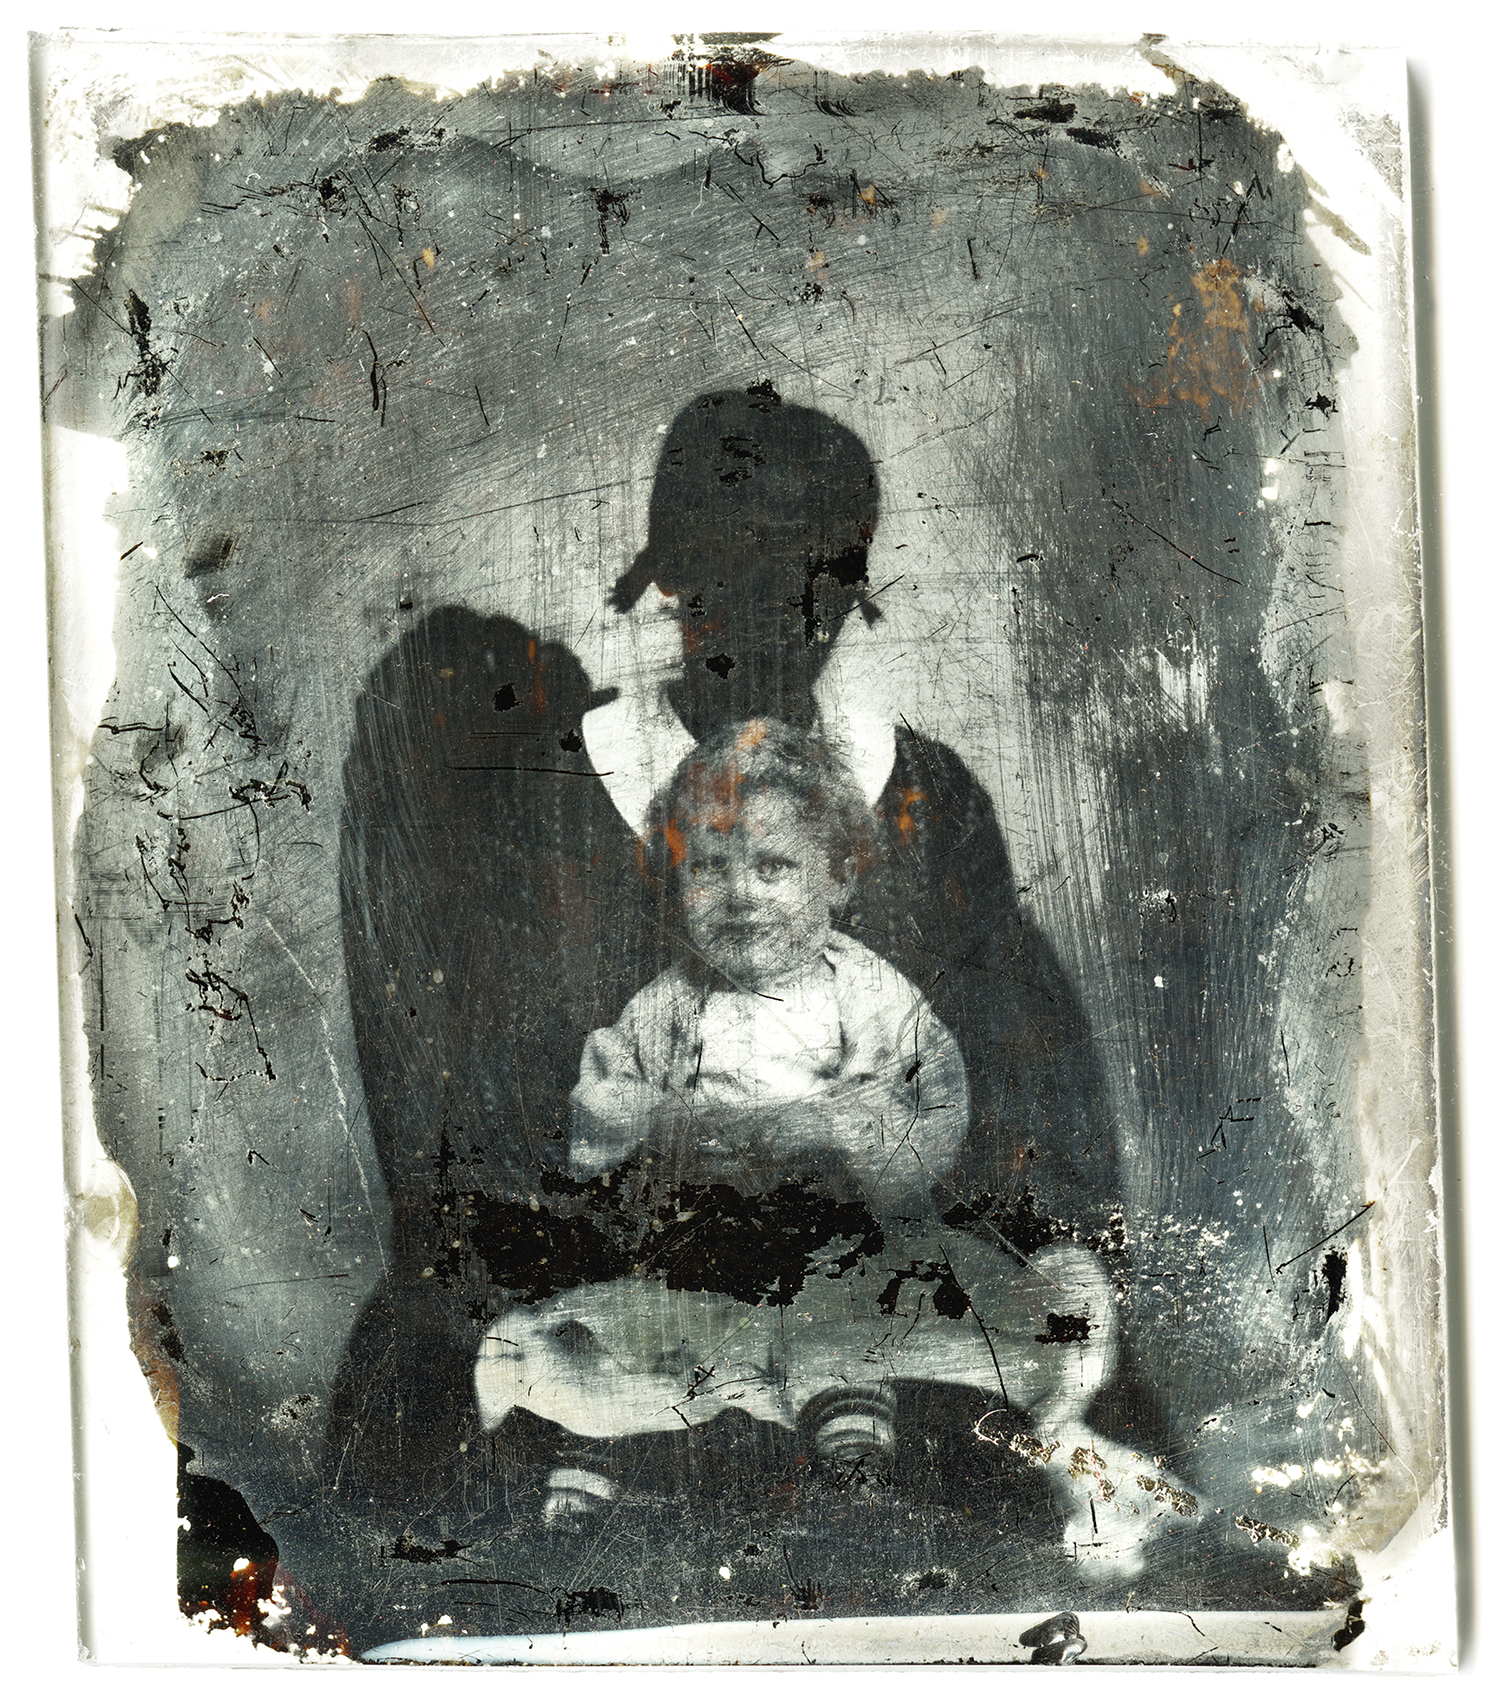 Nanny and Child, 2011 - LR11629